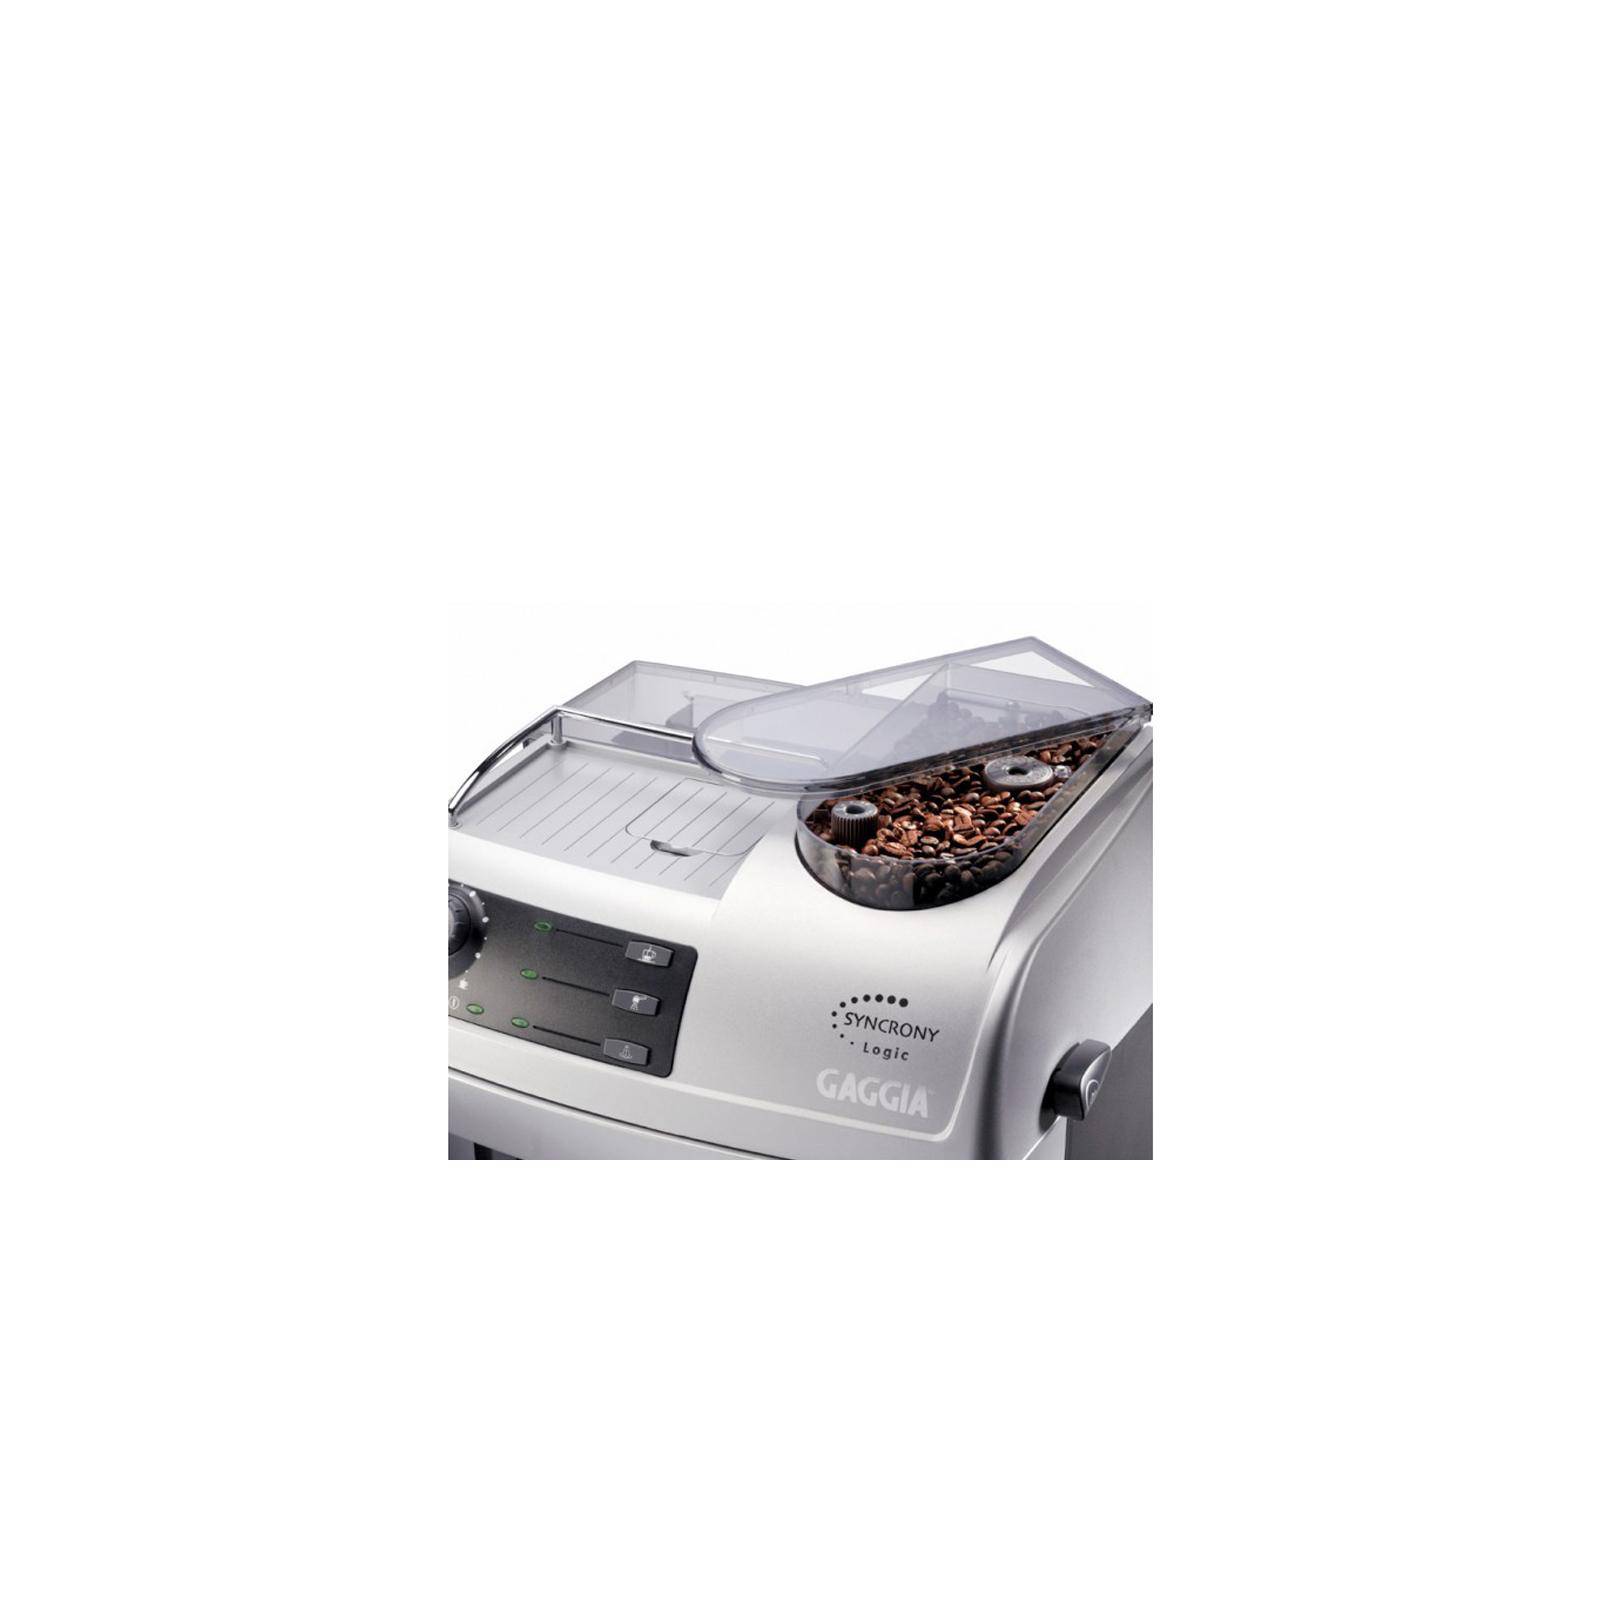 Кофеварка Gaggia Syncrony Logic RS Cappuccino изображение 2